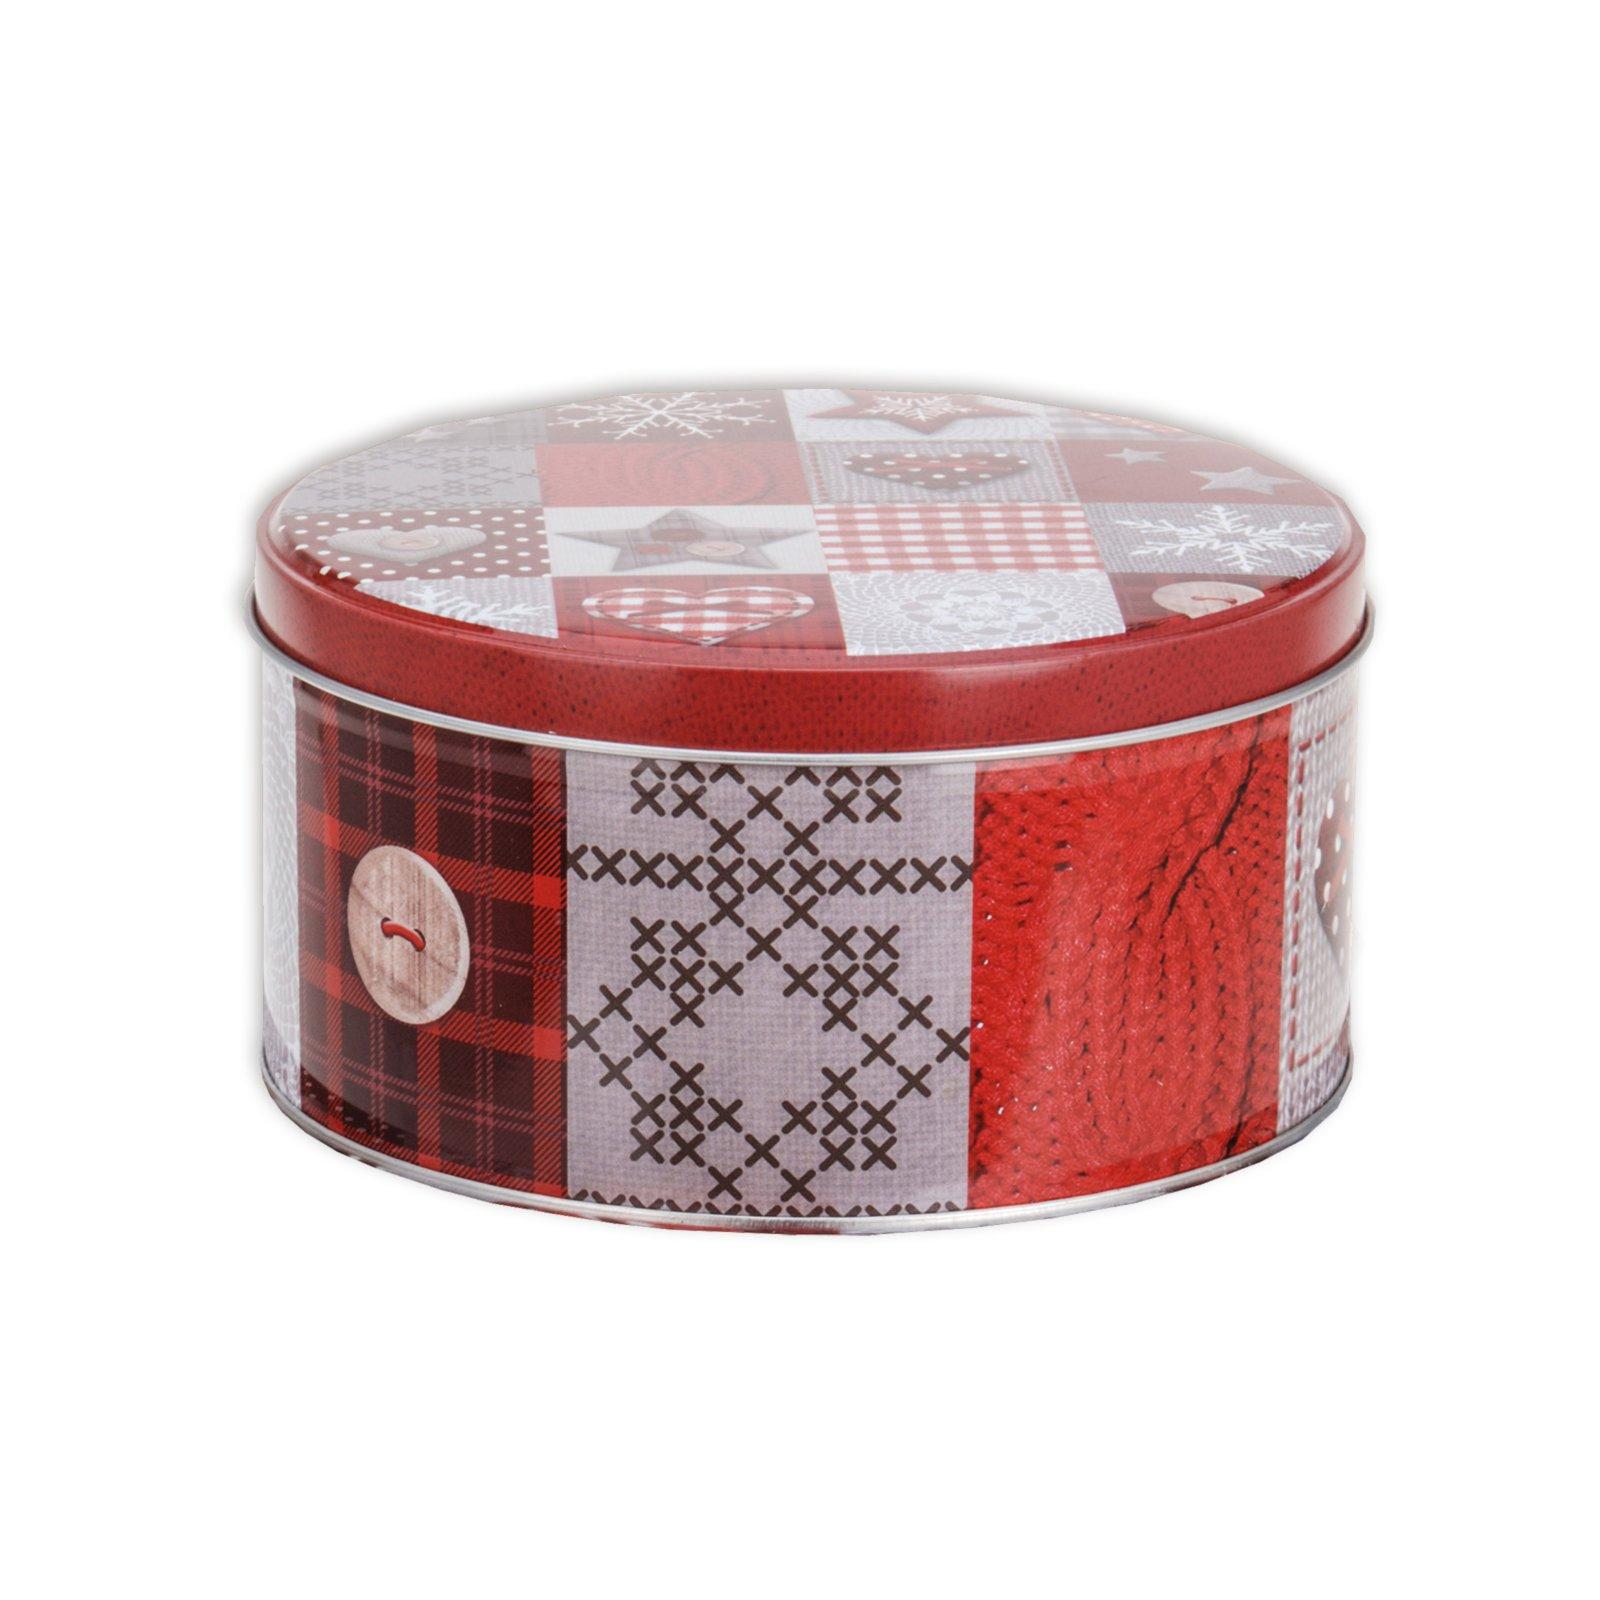 Gebäckdose - rot-grau - rund - Ø 13,8 cm